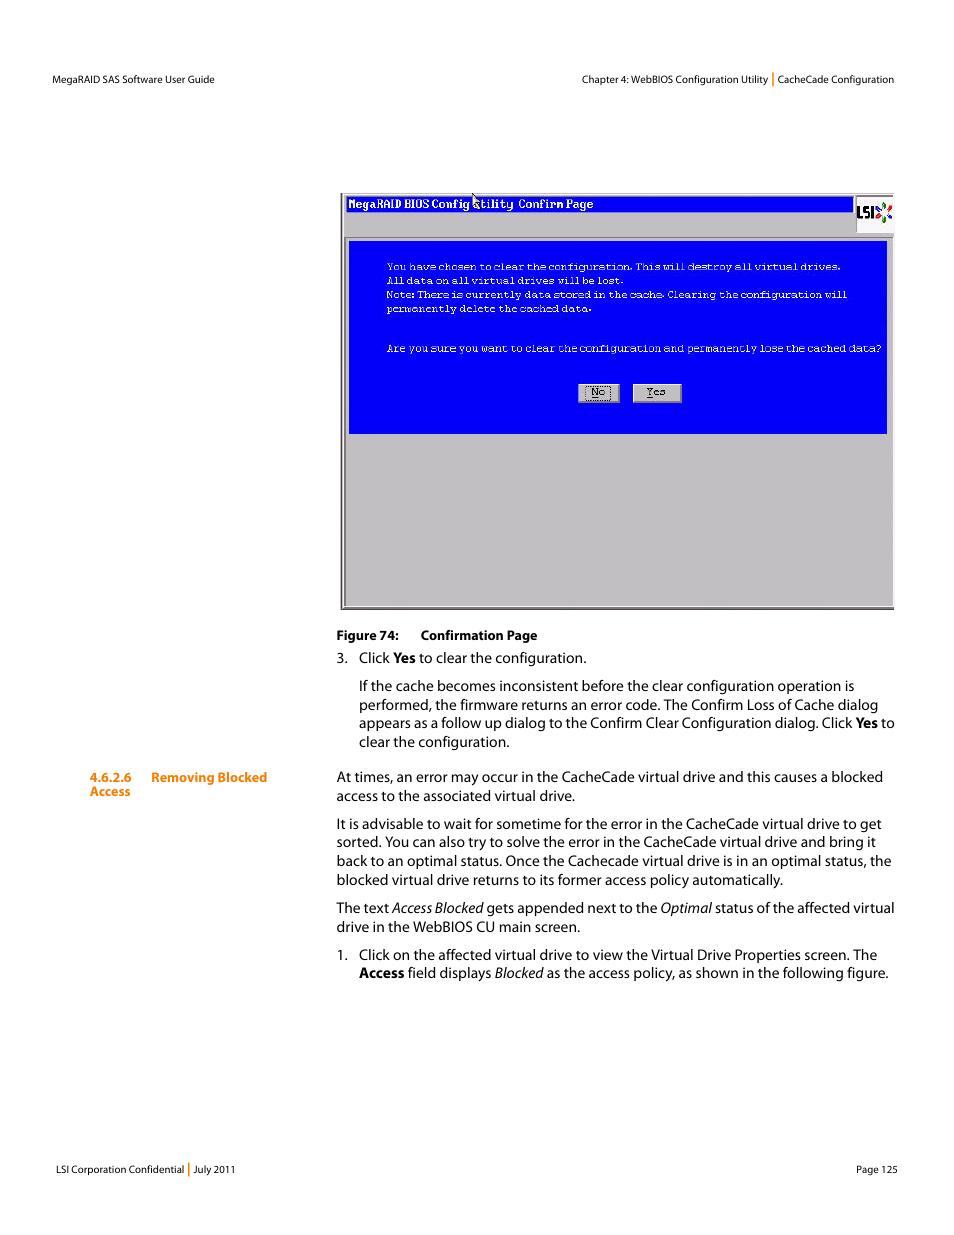 Avago Firmware